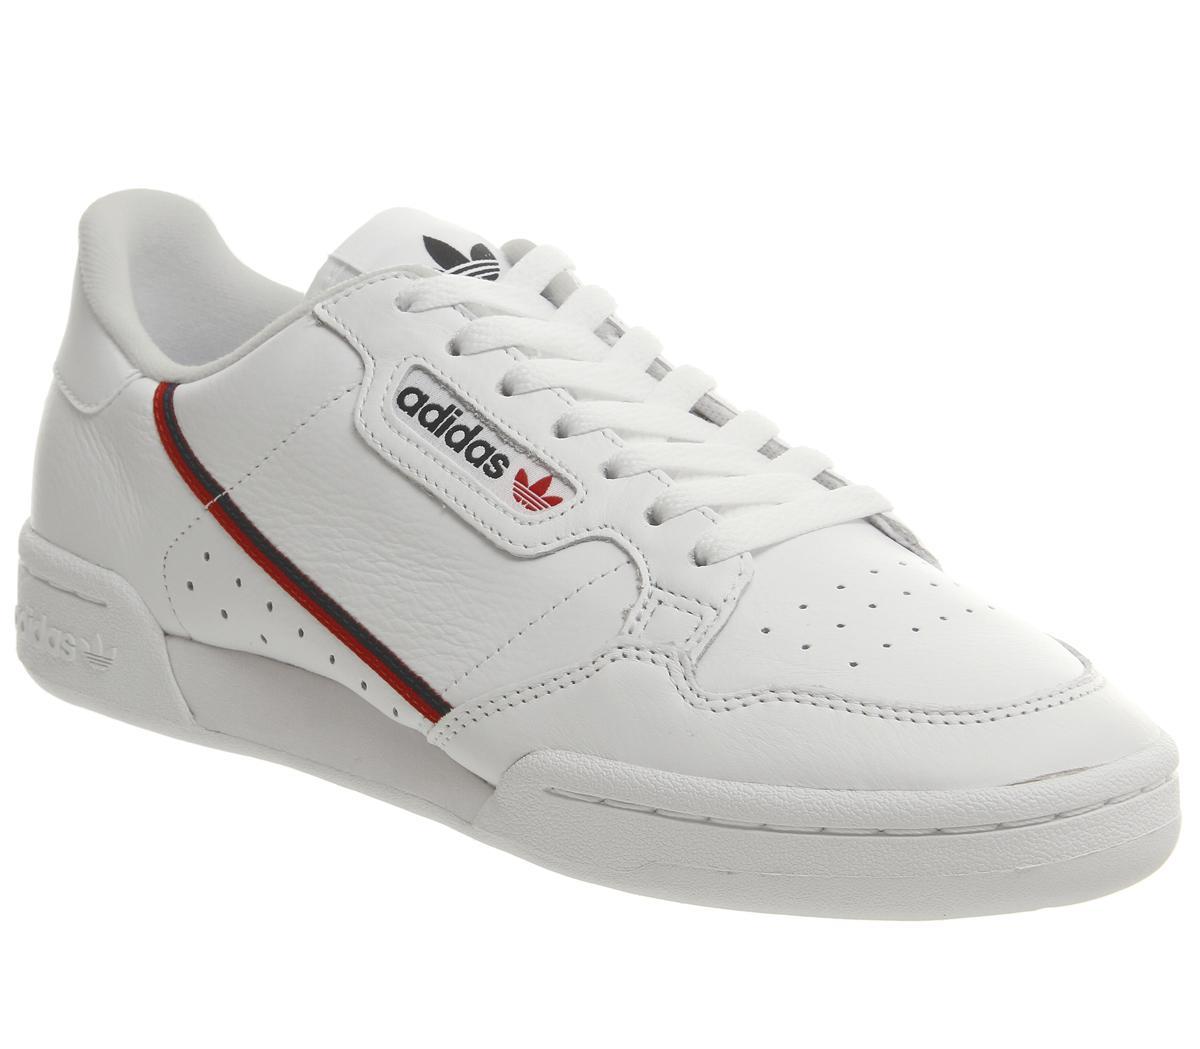 lección Factibilidad circuito  adidas Continental 80s Trainers White Scarlett Collegiate Navy - His  trainers